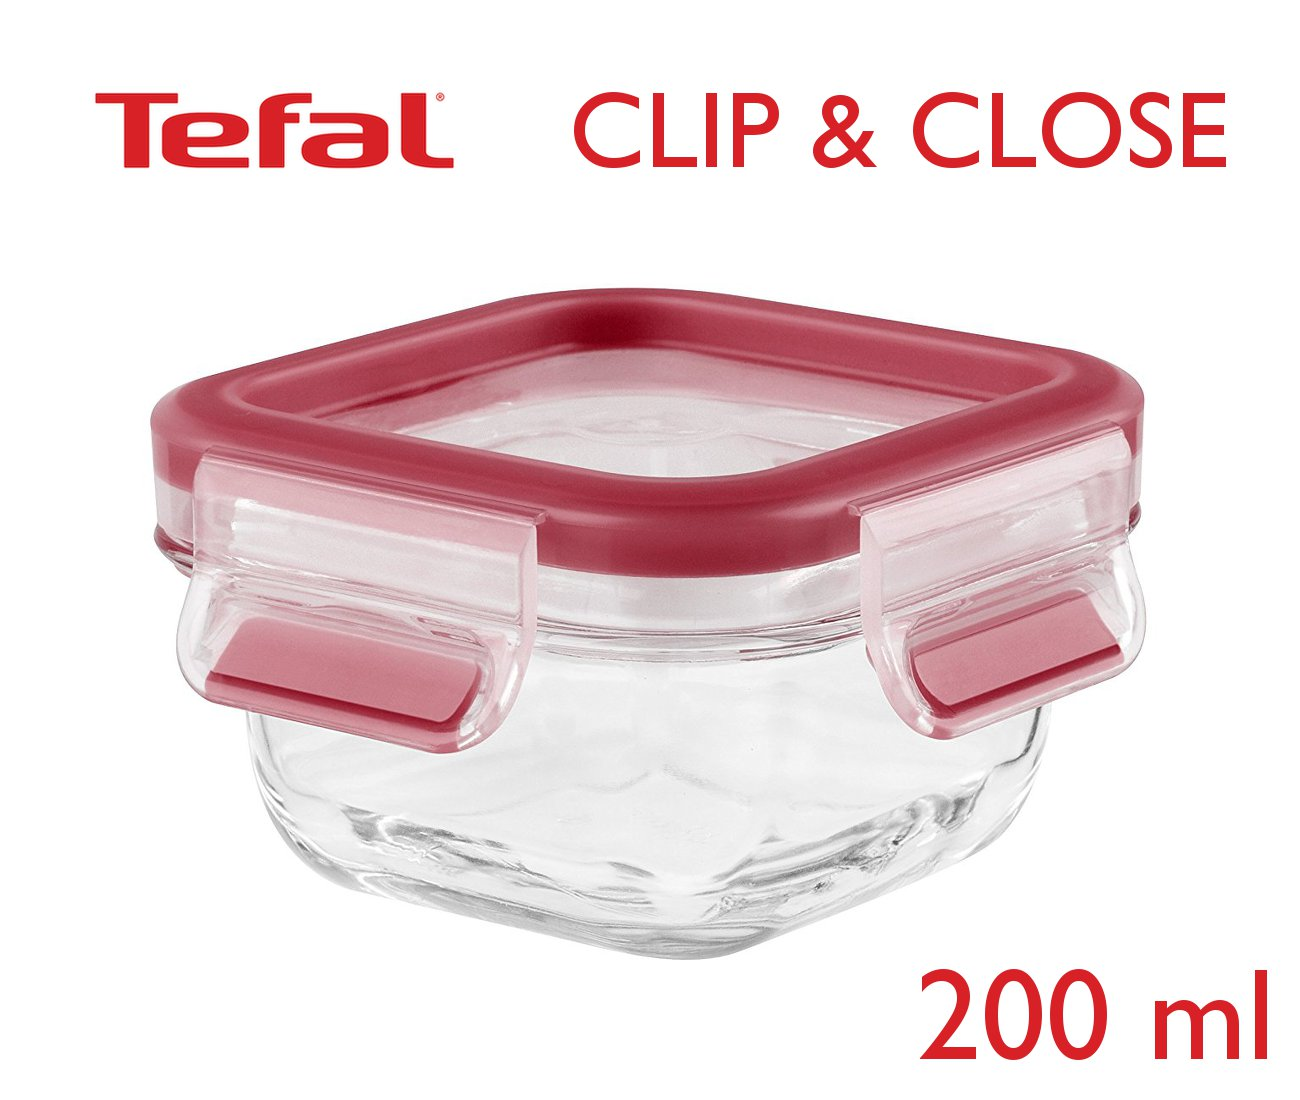 Tefal Clip & Close φαγητοδοχείο γυάλινο 200ml